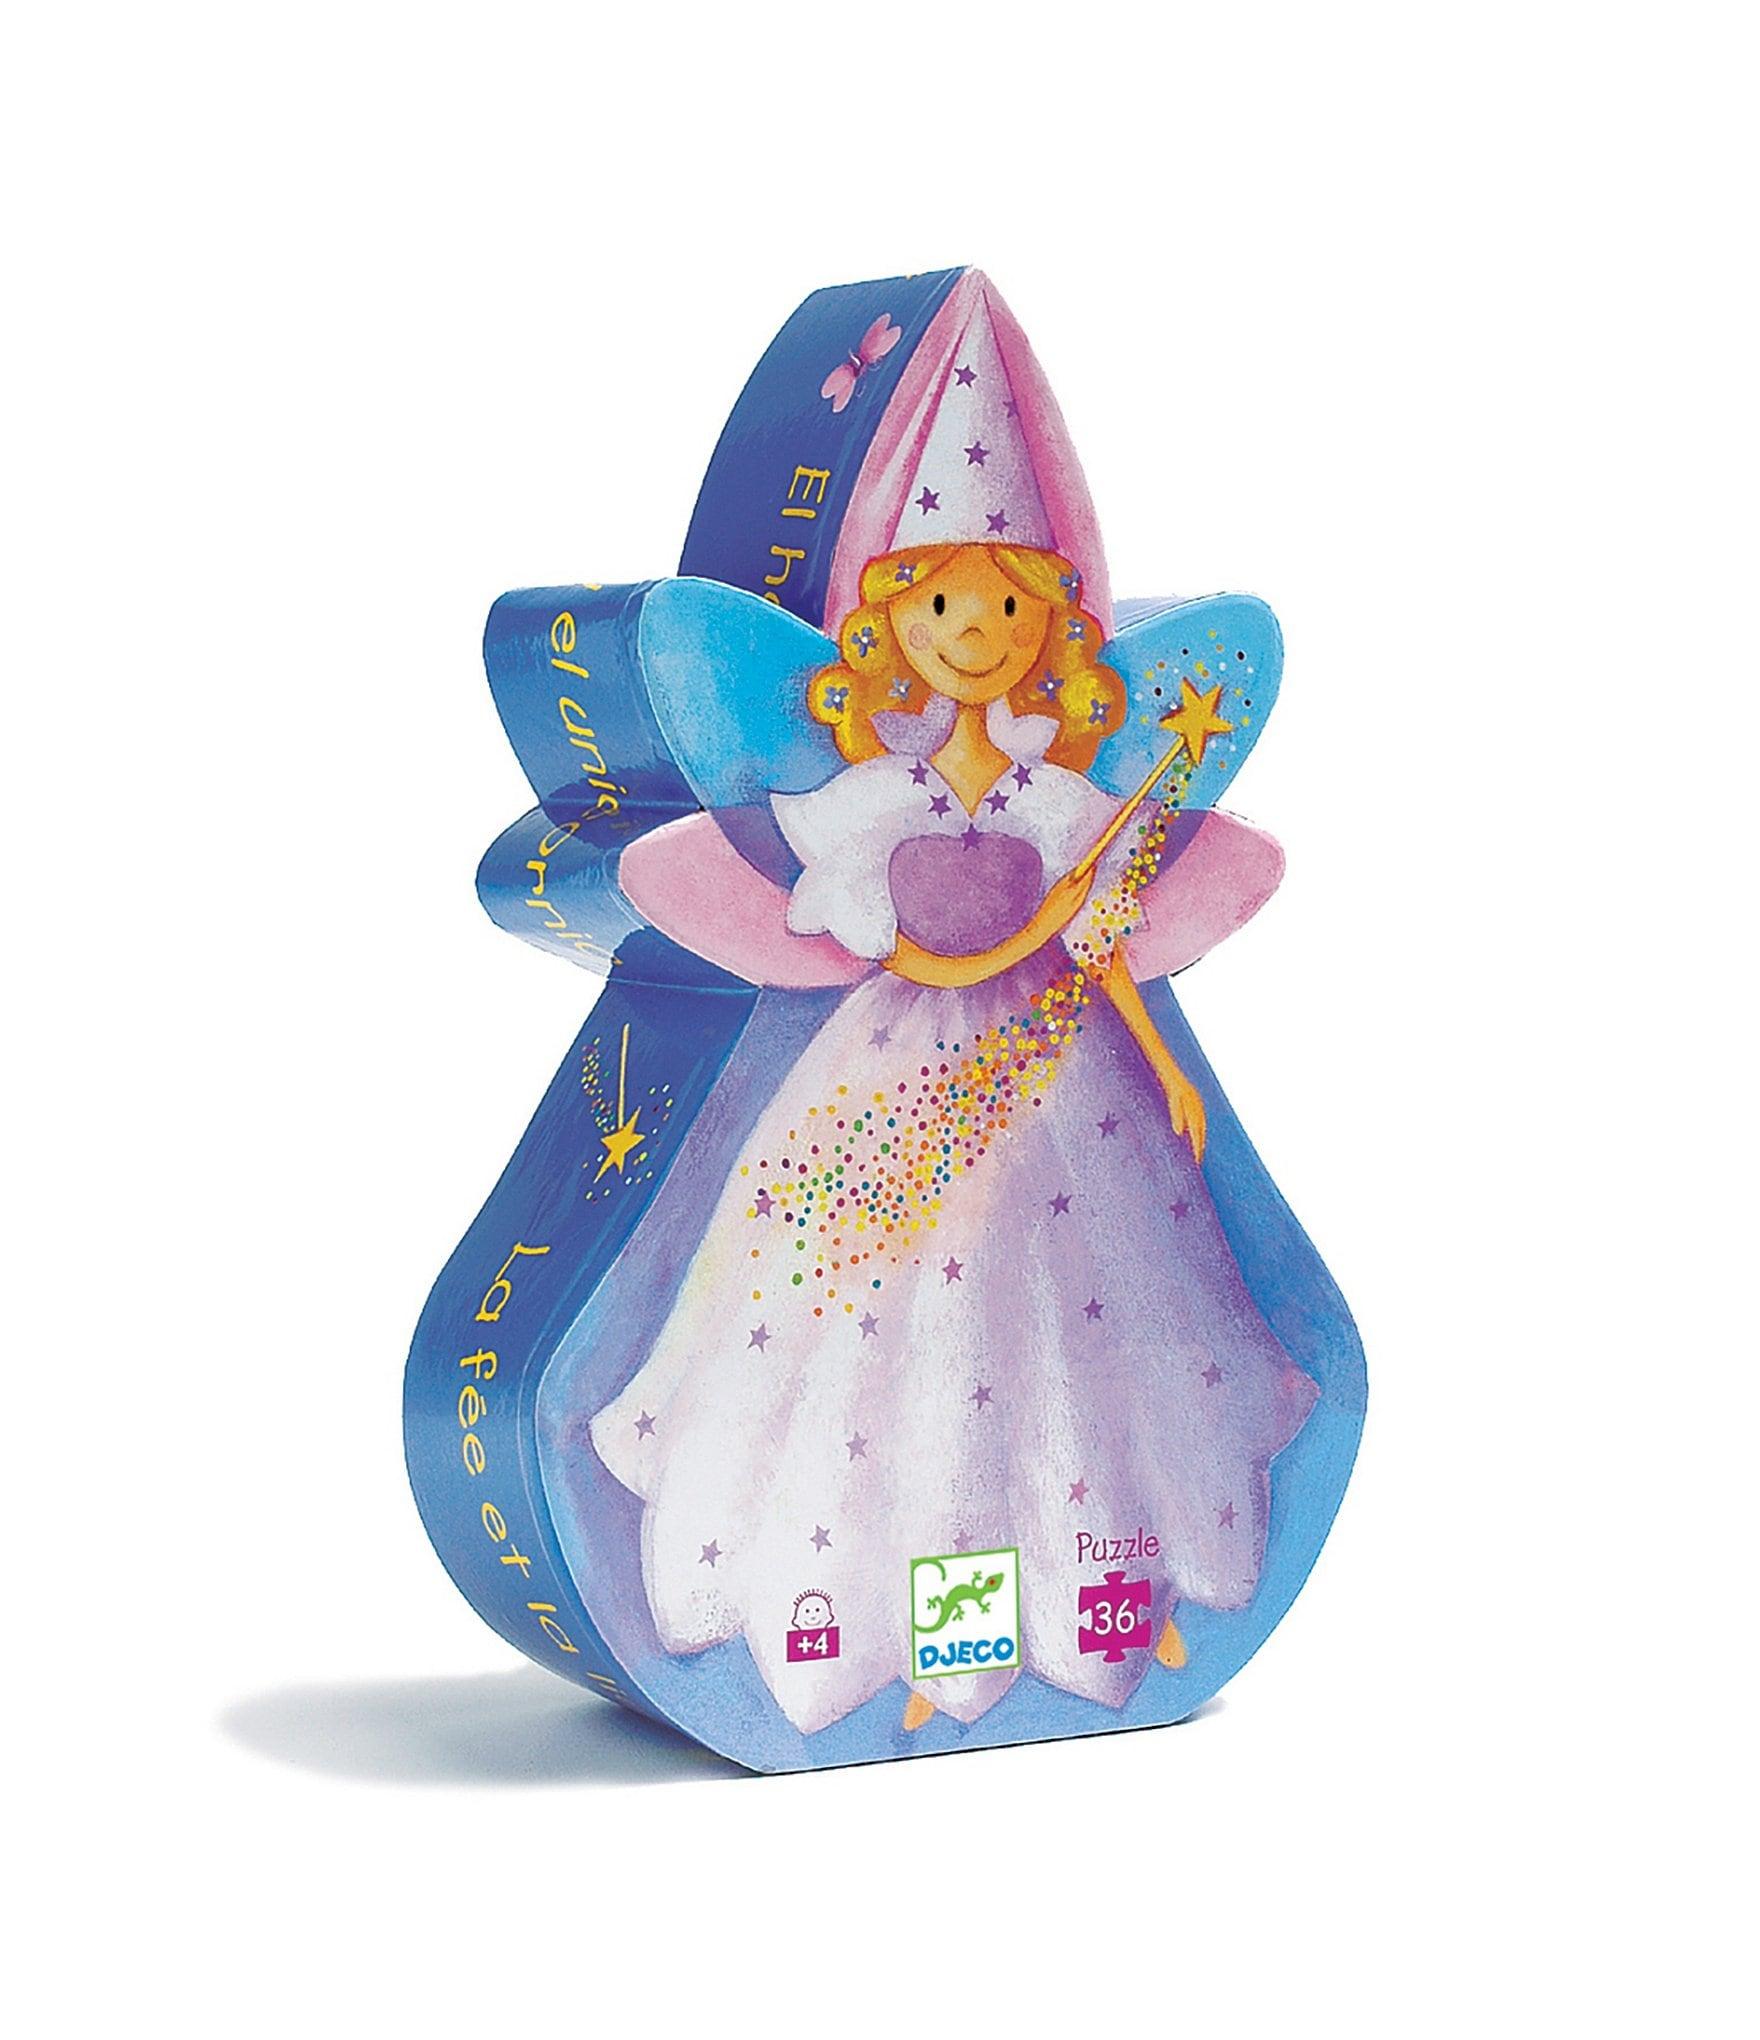 Circle Track Supply >> Djeco Fairy & Unicorn Puzzle | Dillard's